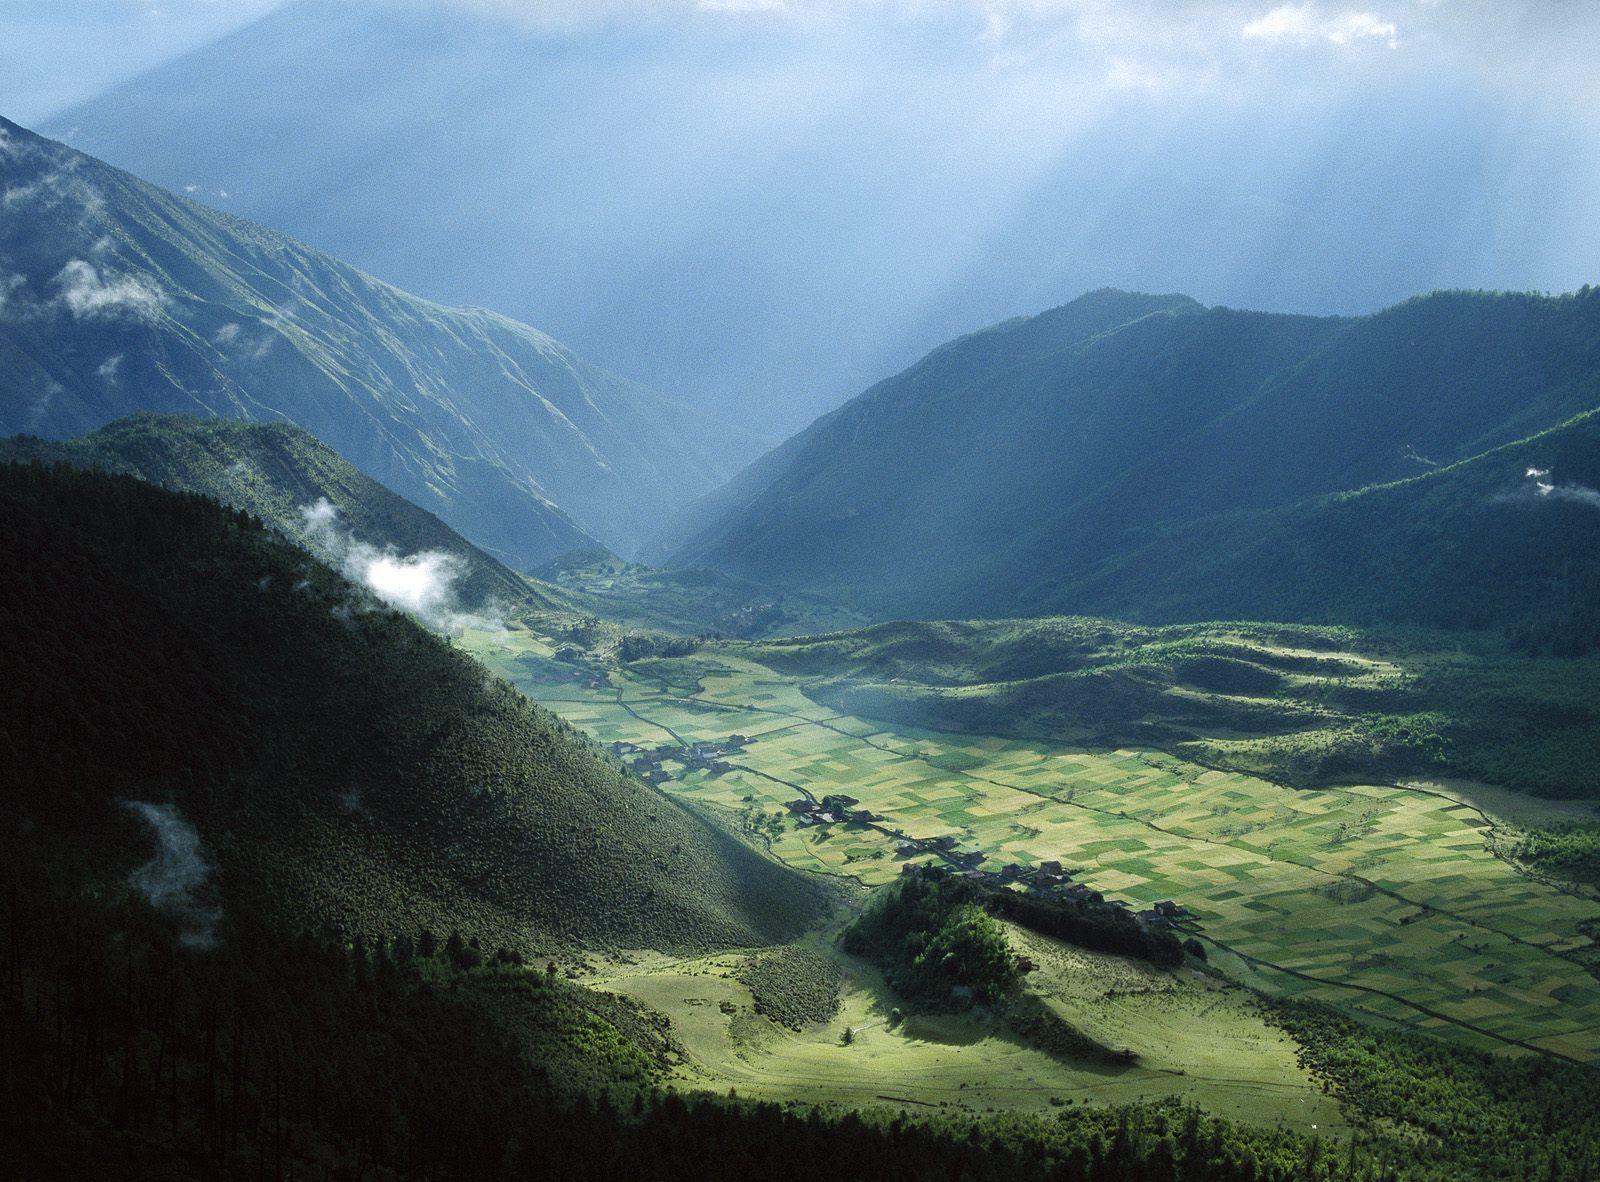 ultimate village in tibet wallpapers - 1600x1182 - 368271